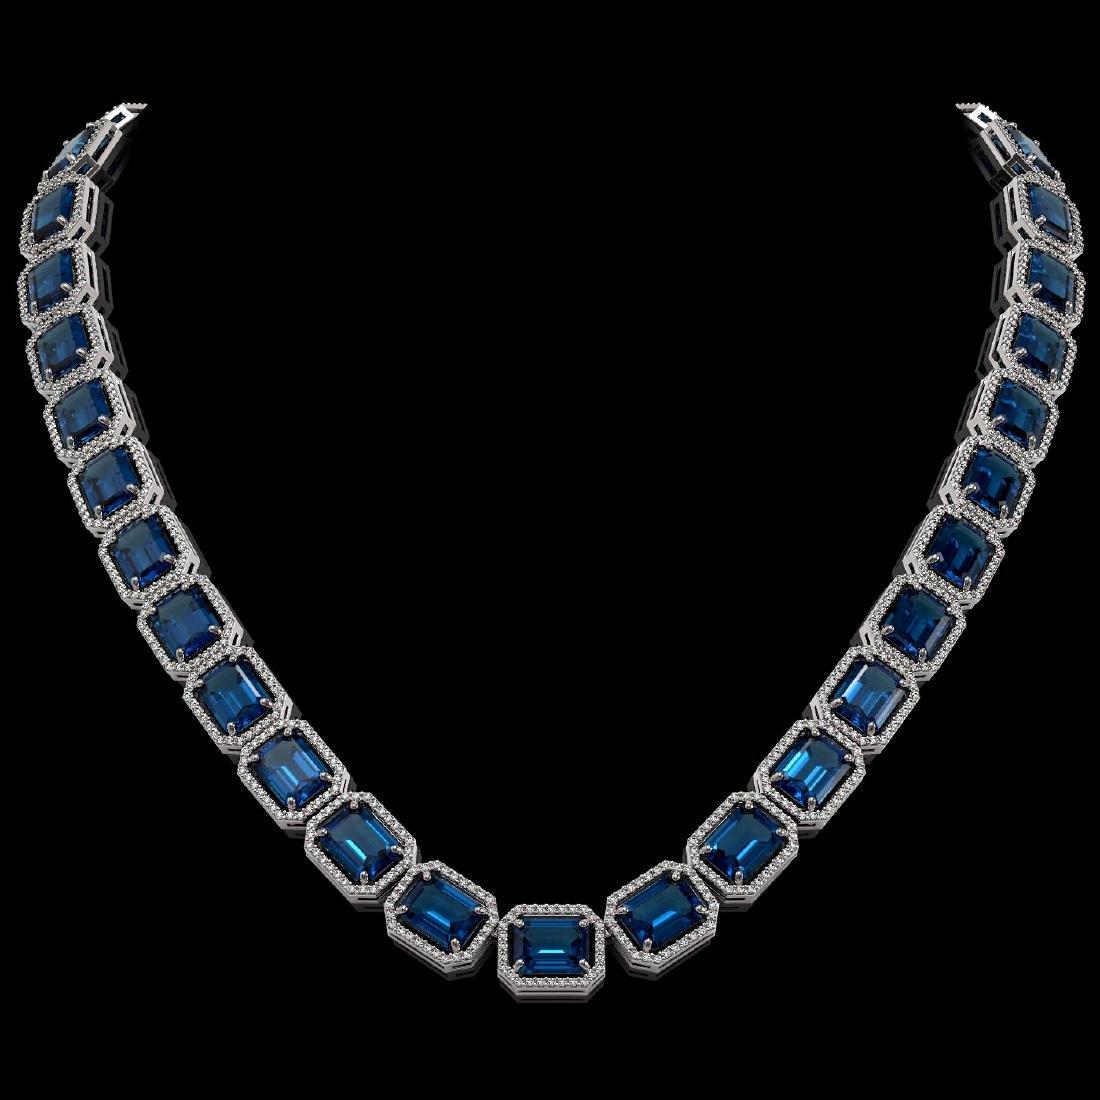 79.66 CTW London Topaz & Diamond Halo Necklace 10K